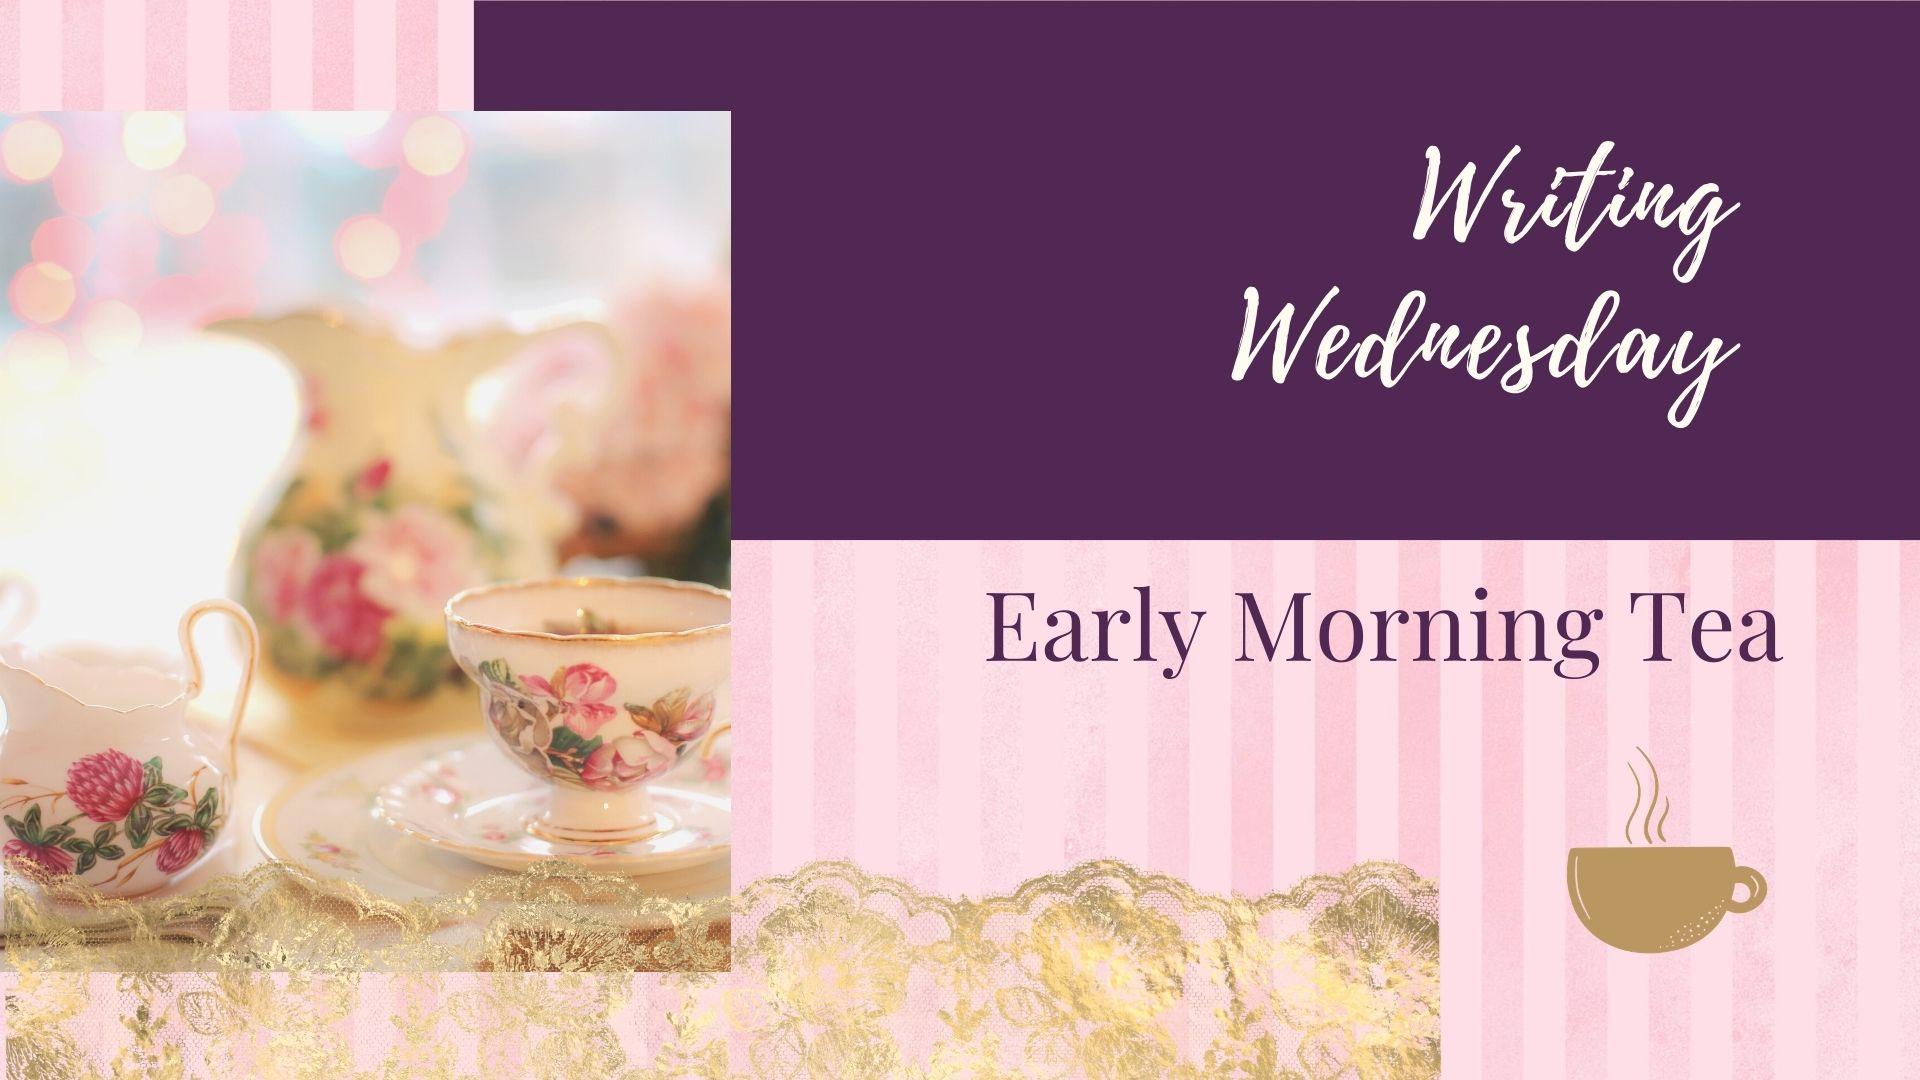 Writing Wednesday: Early Morning Tea